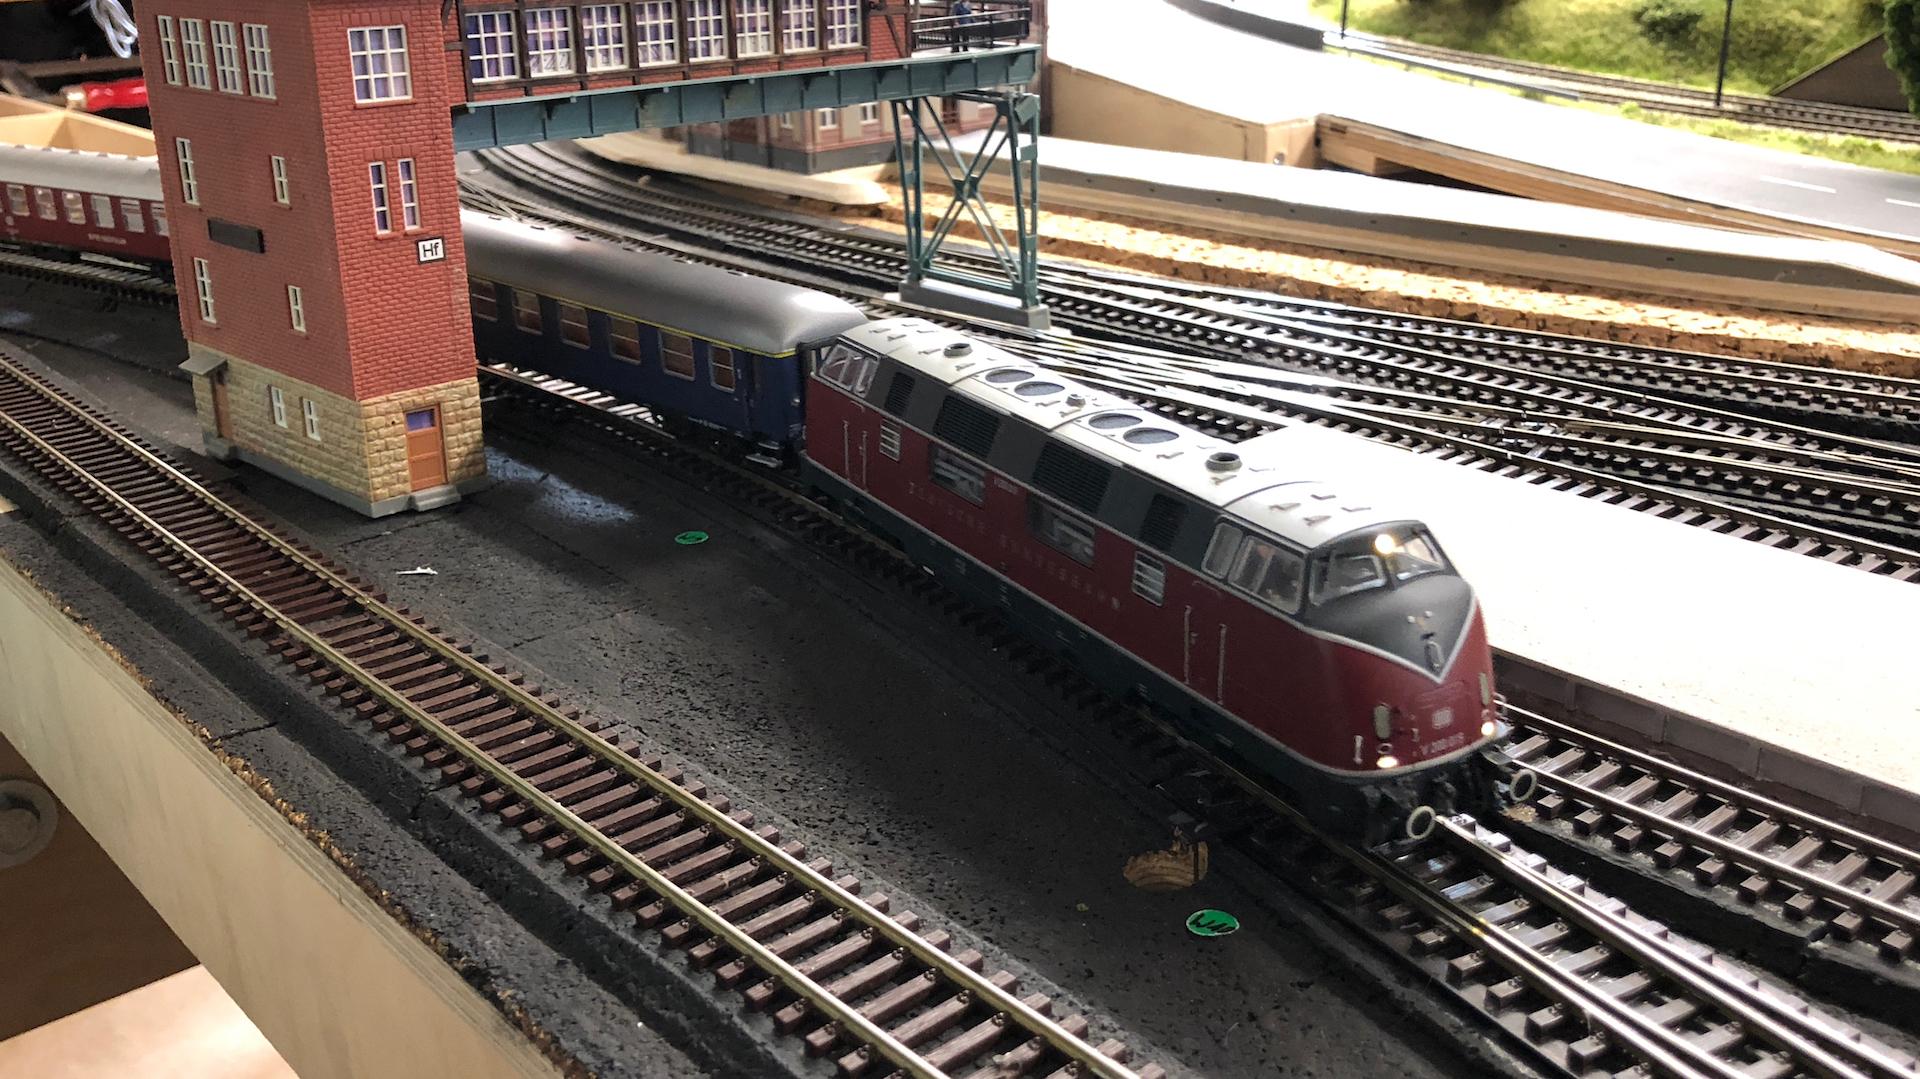 18_02_24_Schautag-Eisenbahnfreunde-Hameln_012